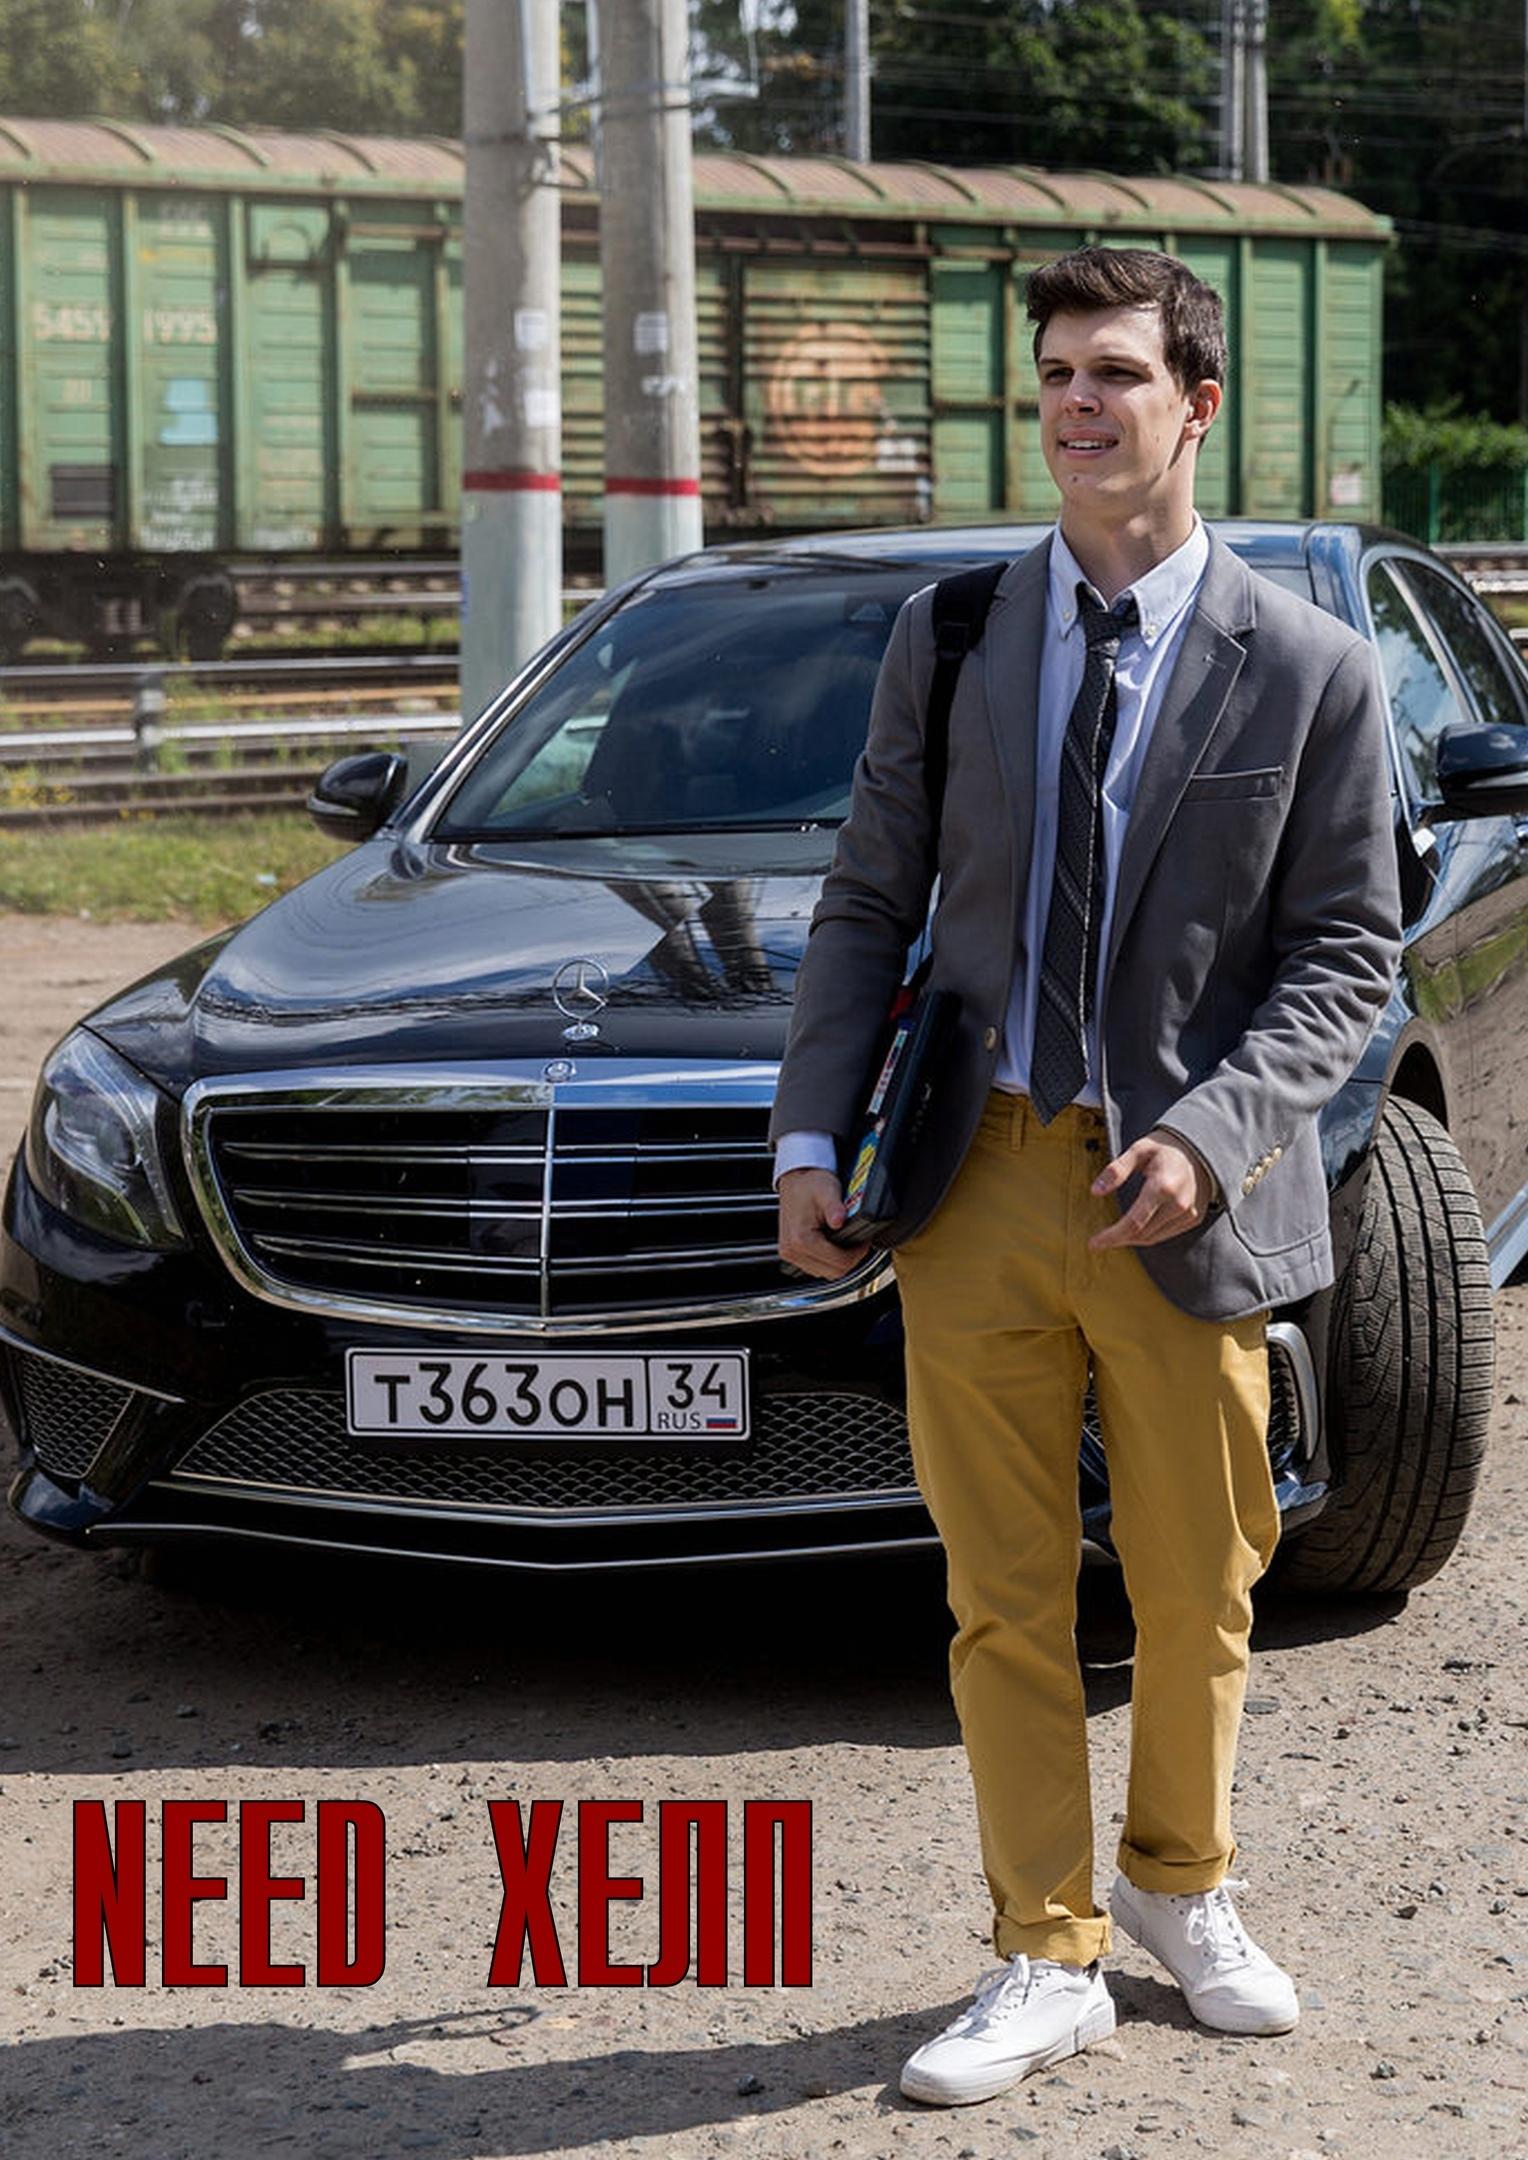 Комедия «Nееd xeлп» (2020) 1-4 серия из 8 HD